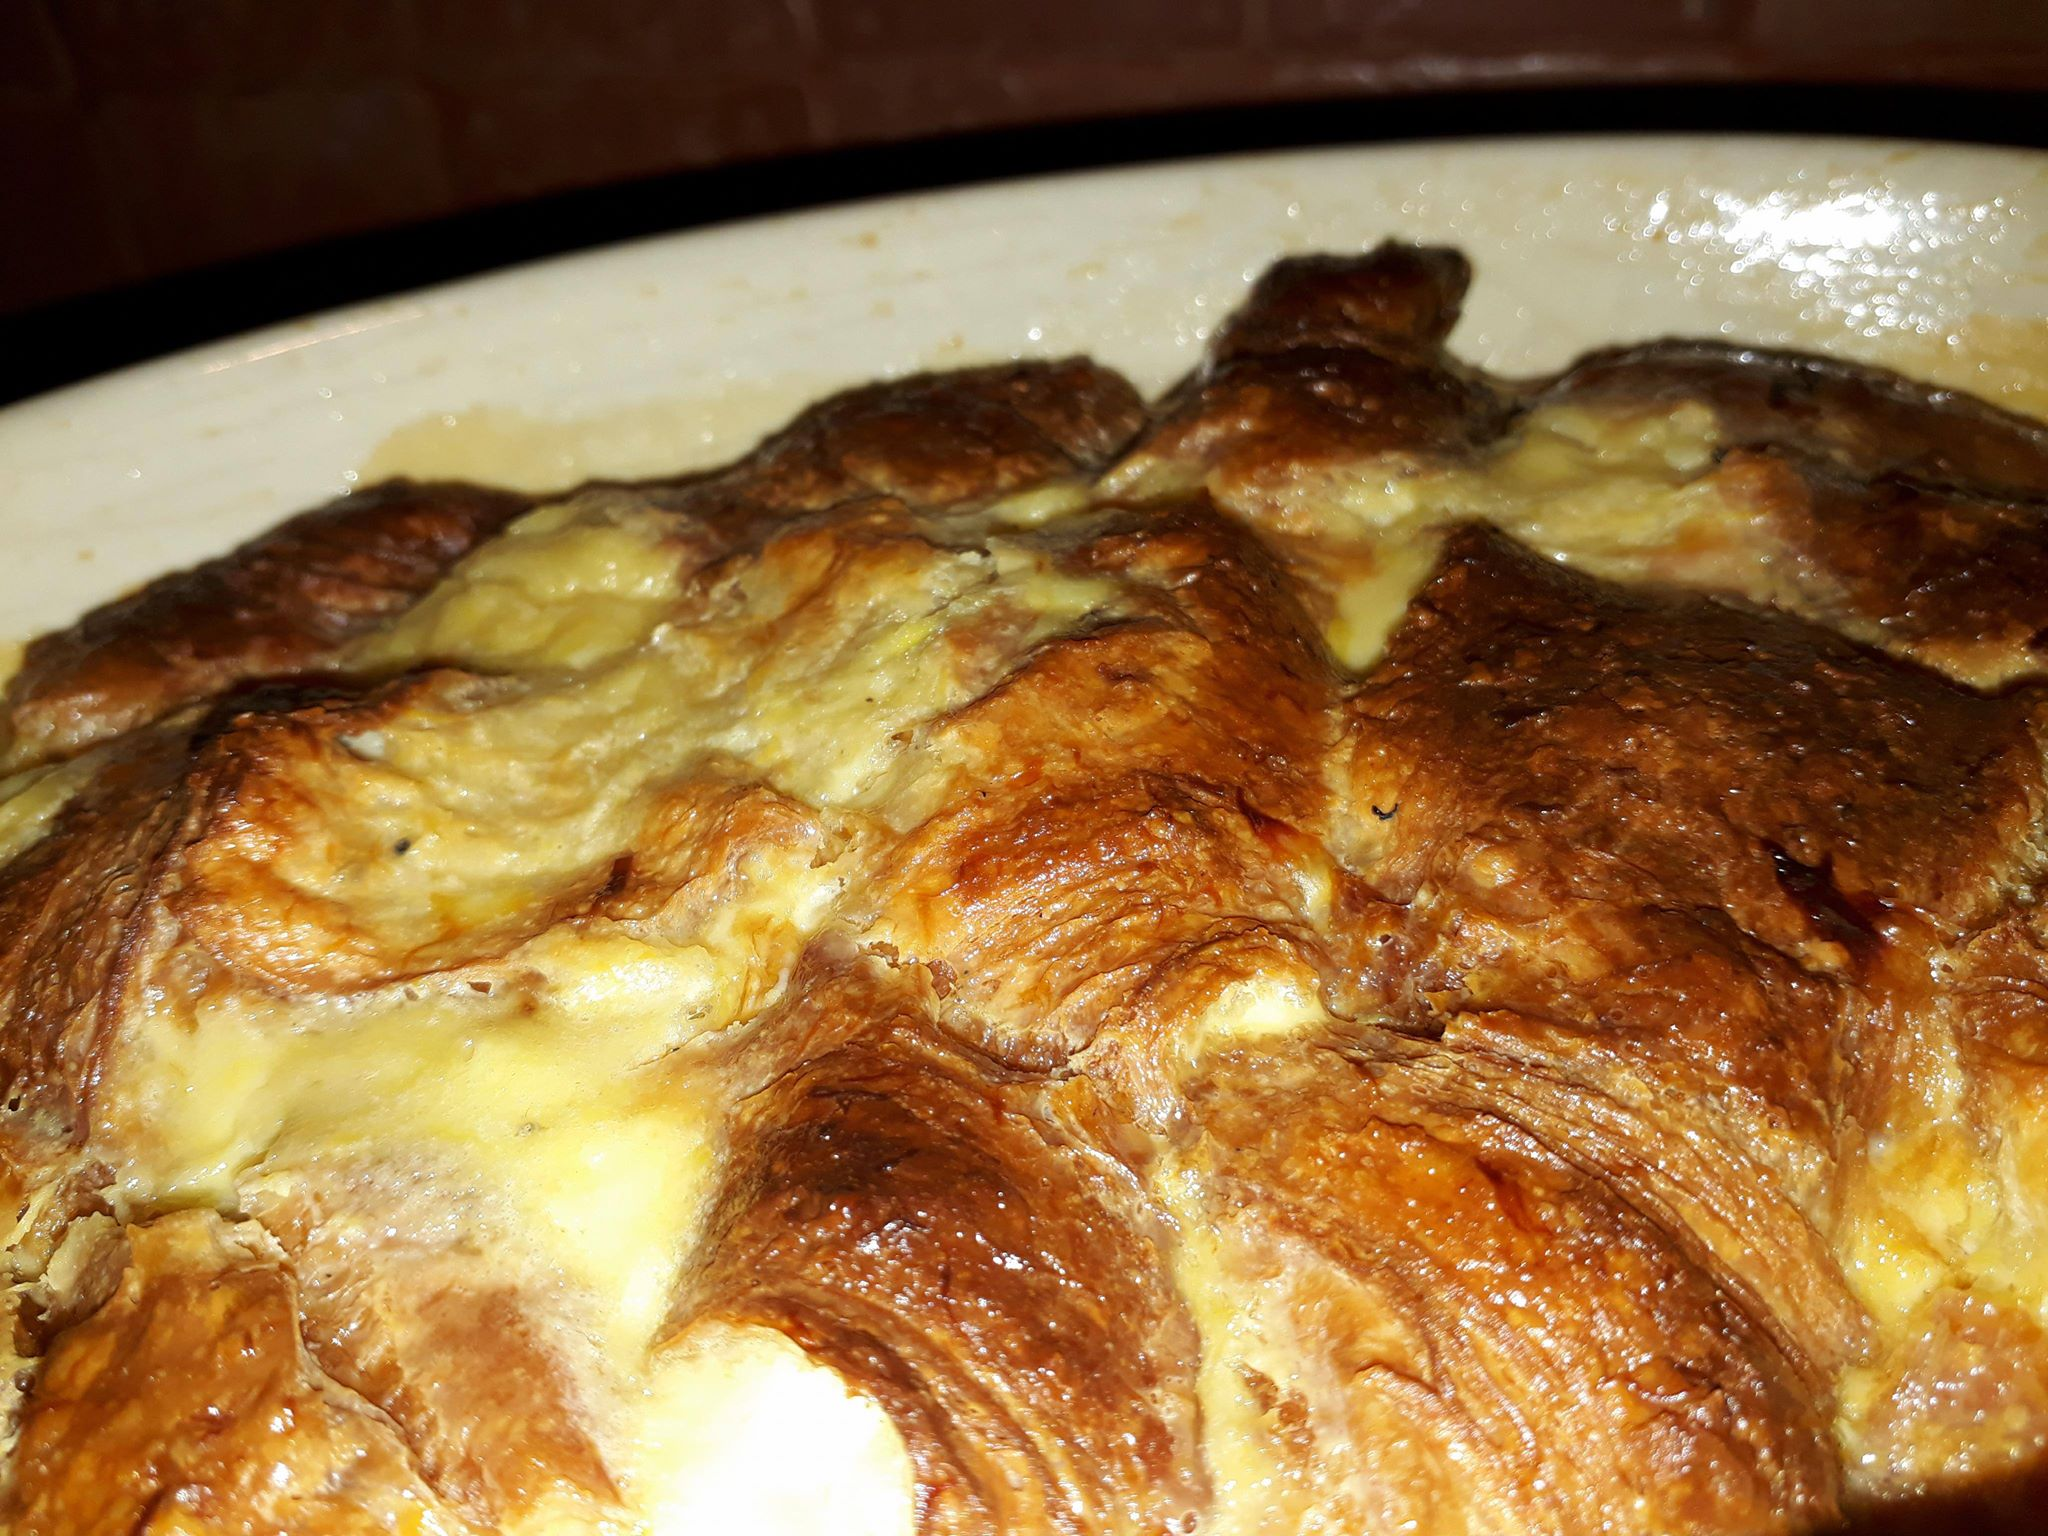 caramel croissant bread pudding recipe, caramel croissant pudding, caramel croissant pudding, Nigella Lawson caramel croissant pudding